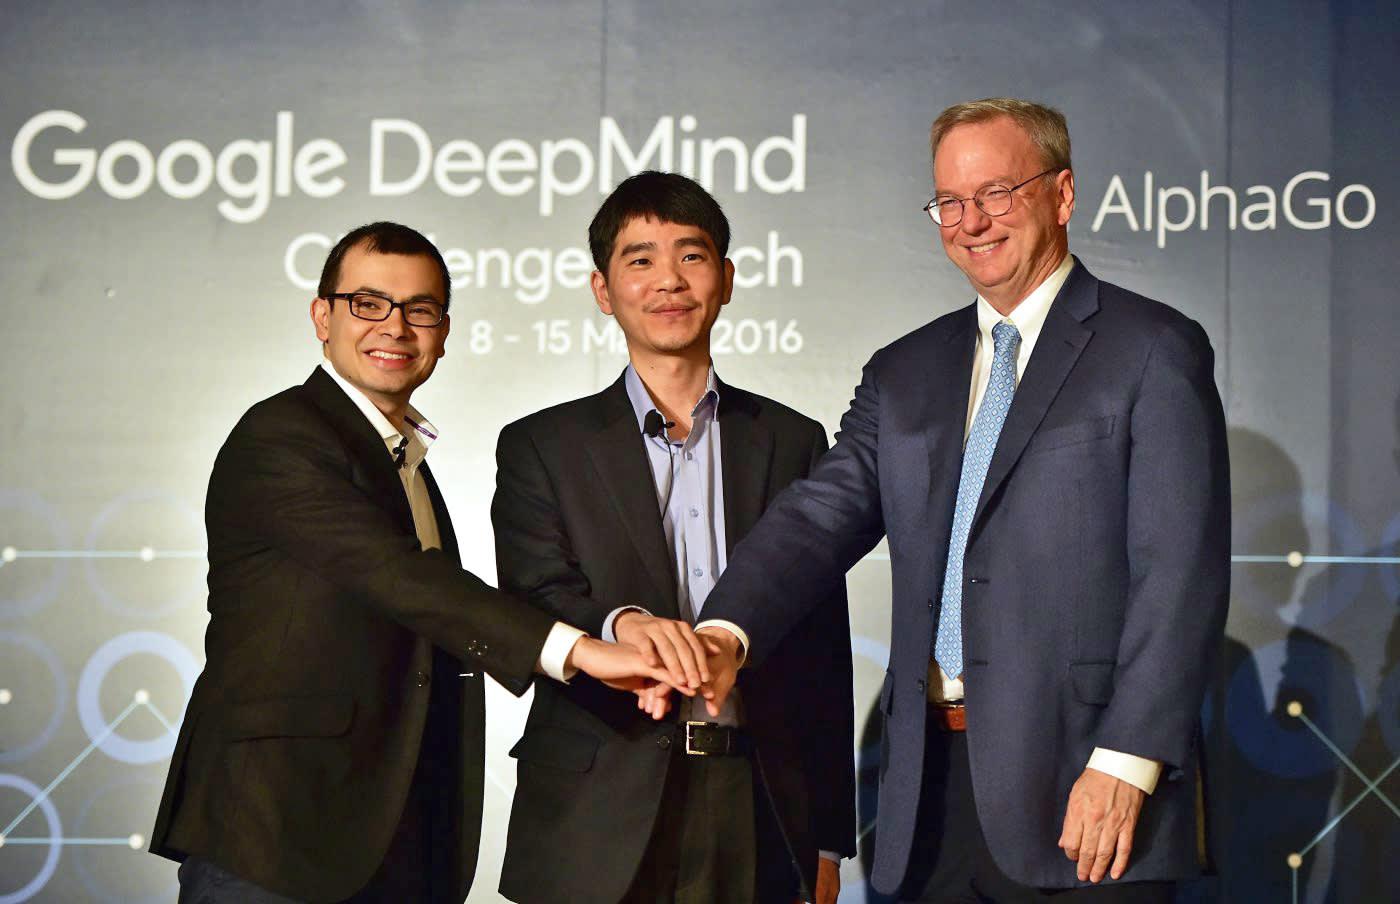 Google's DeepMind AI will take on a Go champ tomorrow night